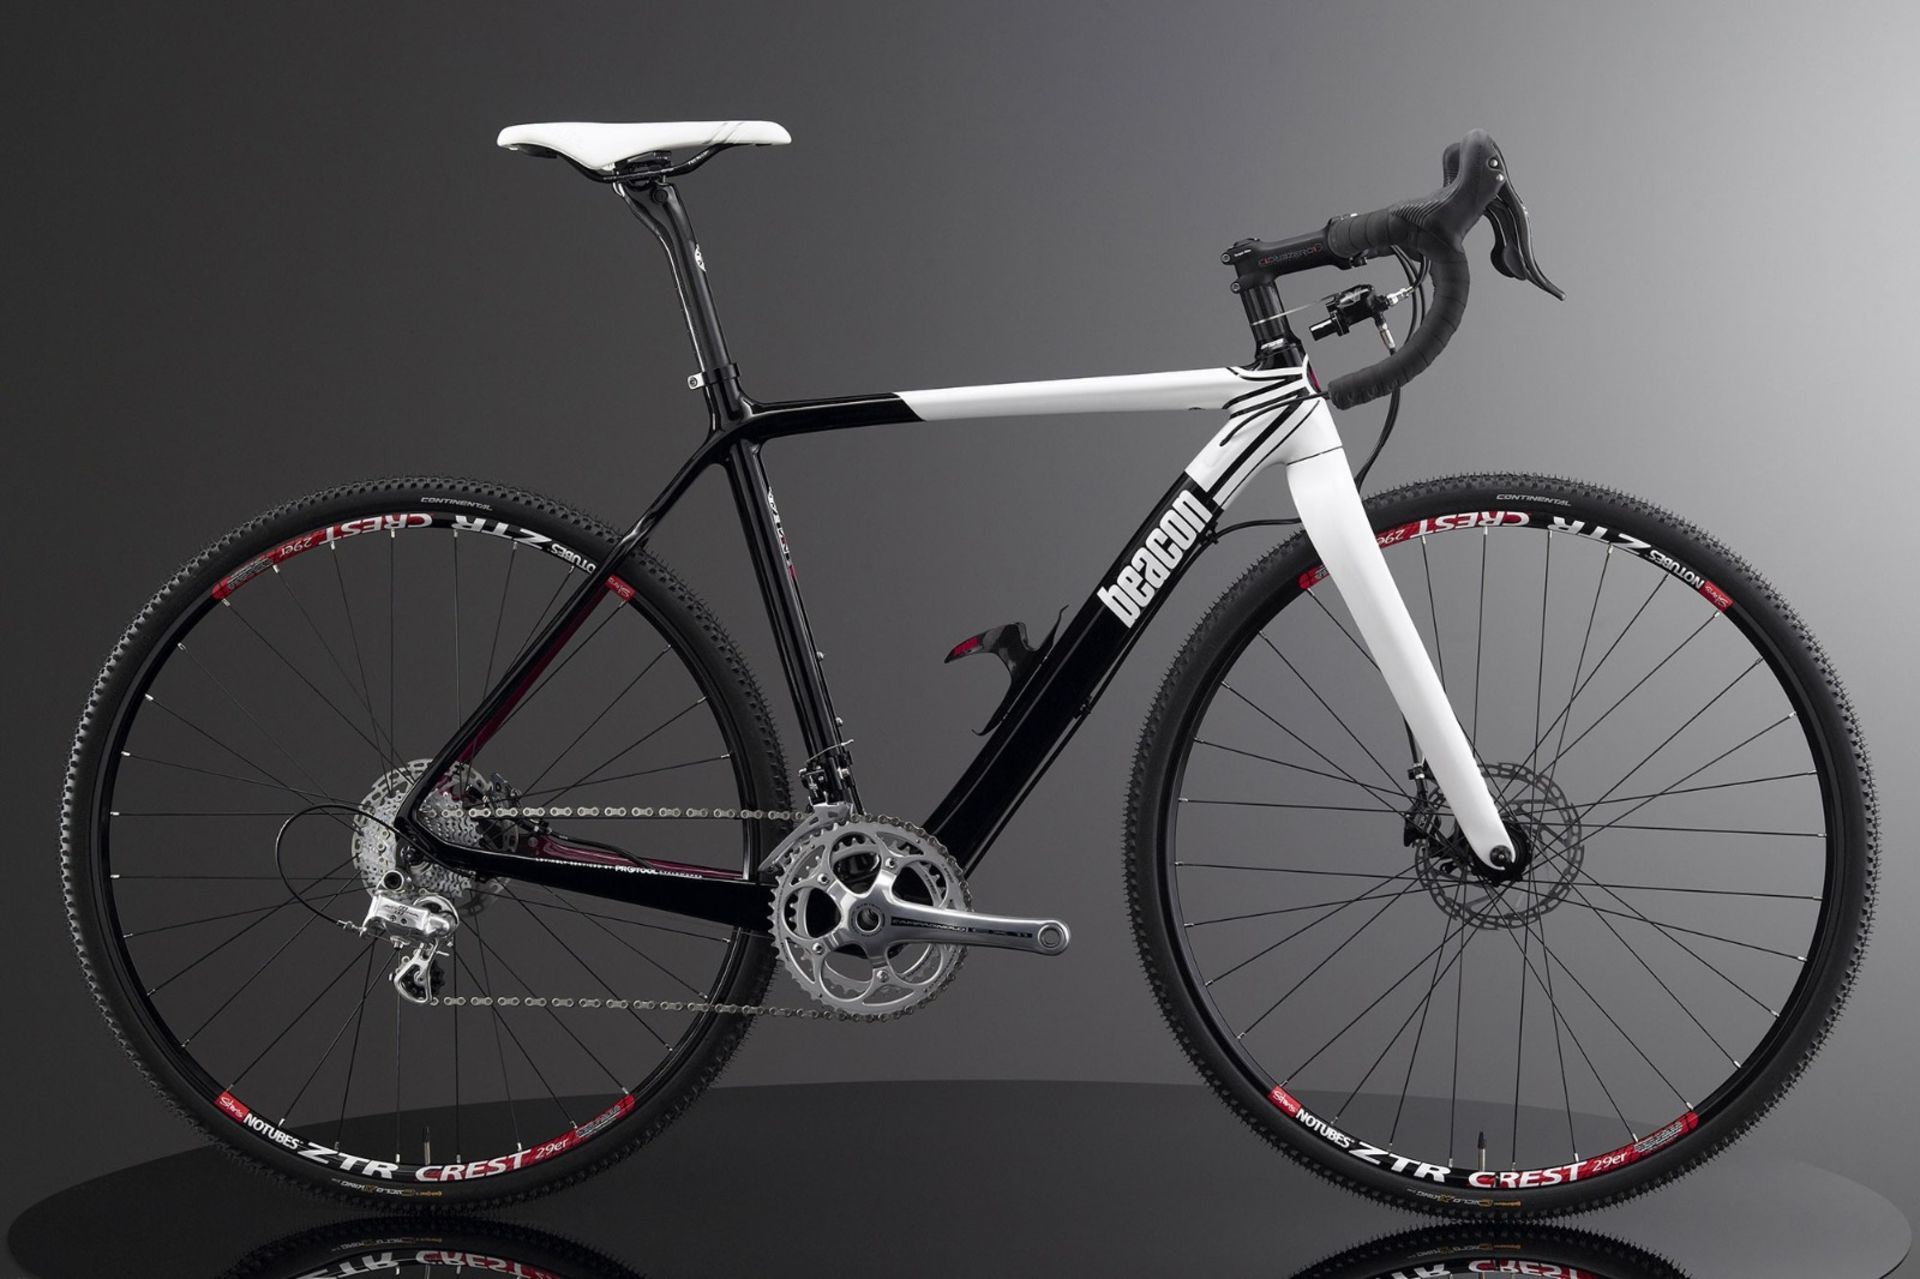 Lot 28 - 1 x Beacon Model BF-45, Size 560, Carbon Fibre Bike Frame in Black & White.